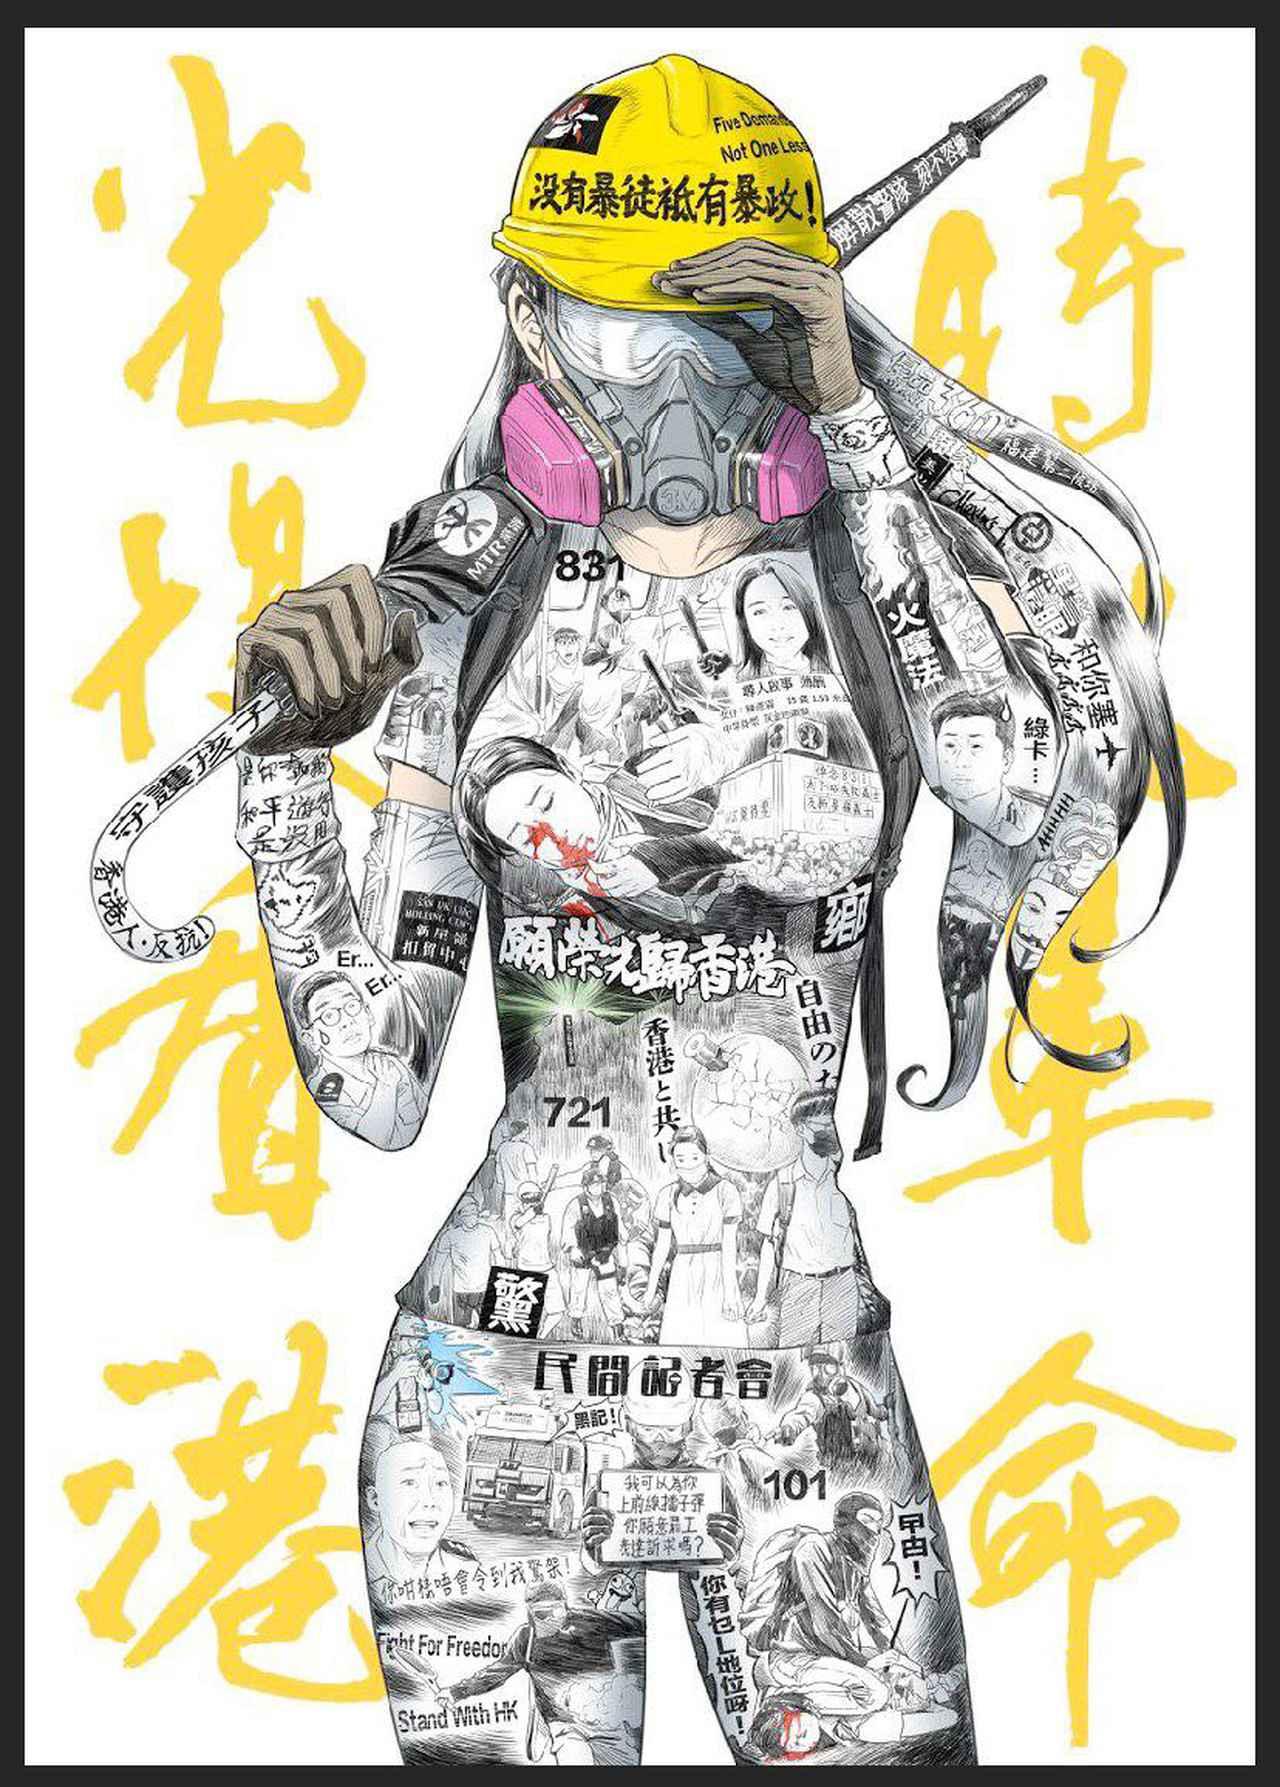 画像: Artist: Kai Lan Egg Title: 香港女勇武 La Femme Courageuse Medium: Digital art 2019